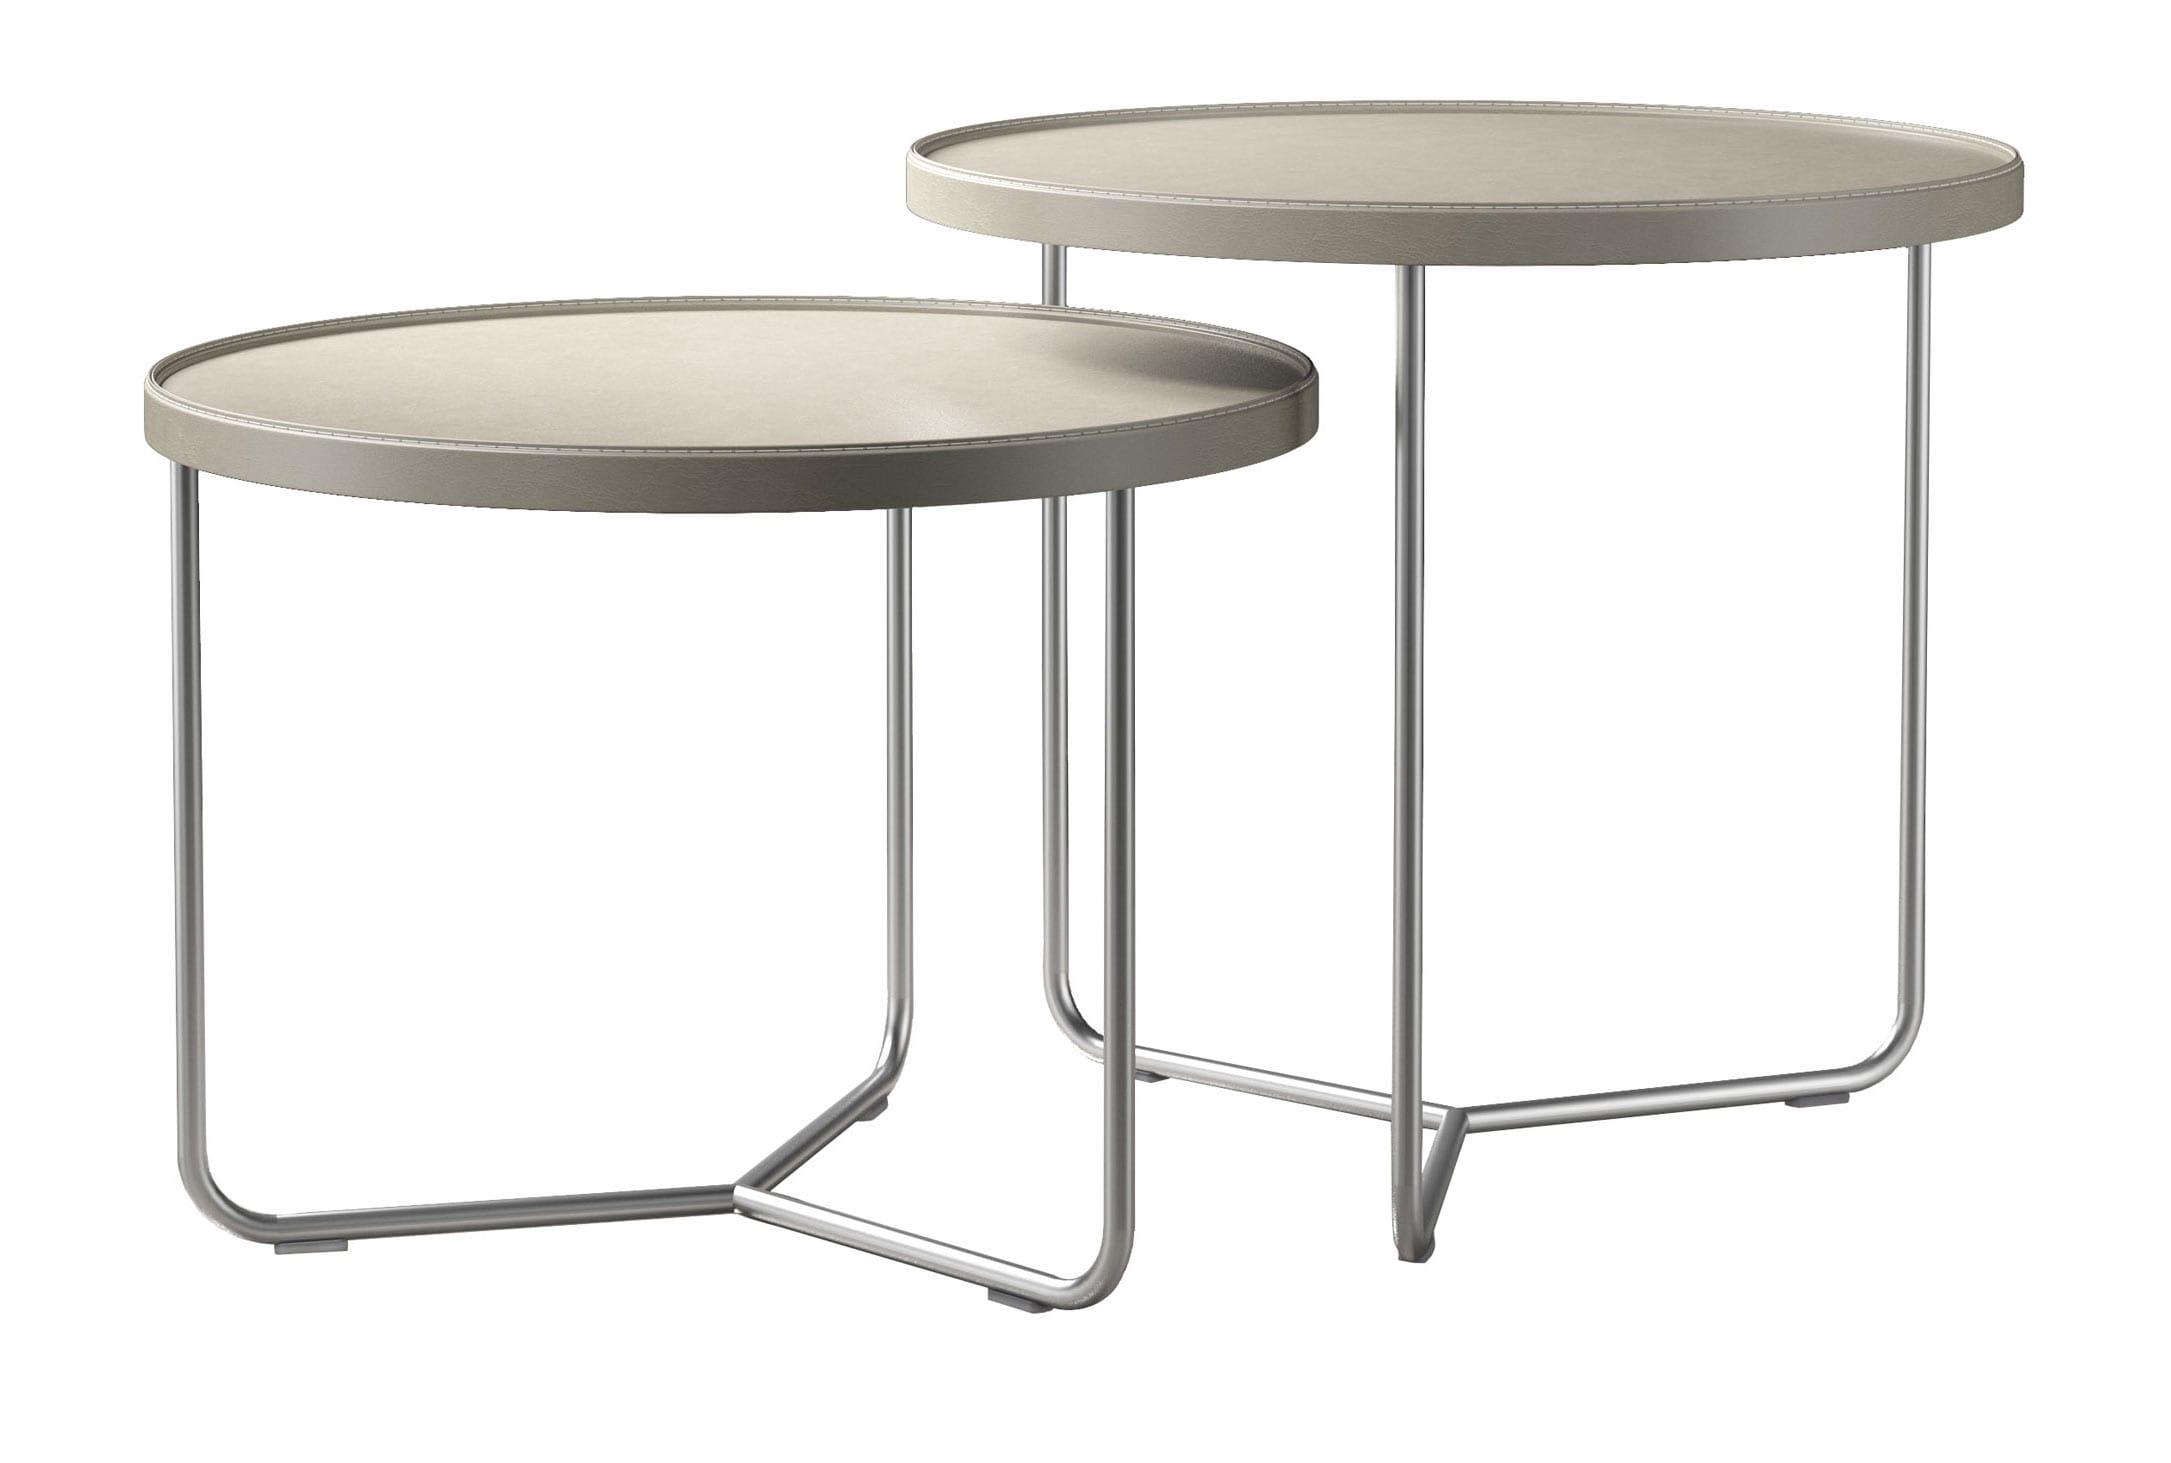 Adelphi Nesting Side Table Set Beige By Modloft (Modloft)